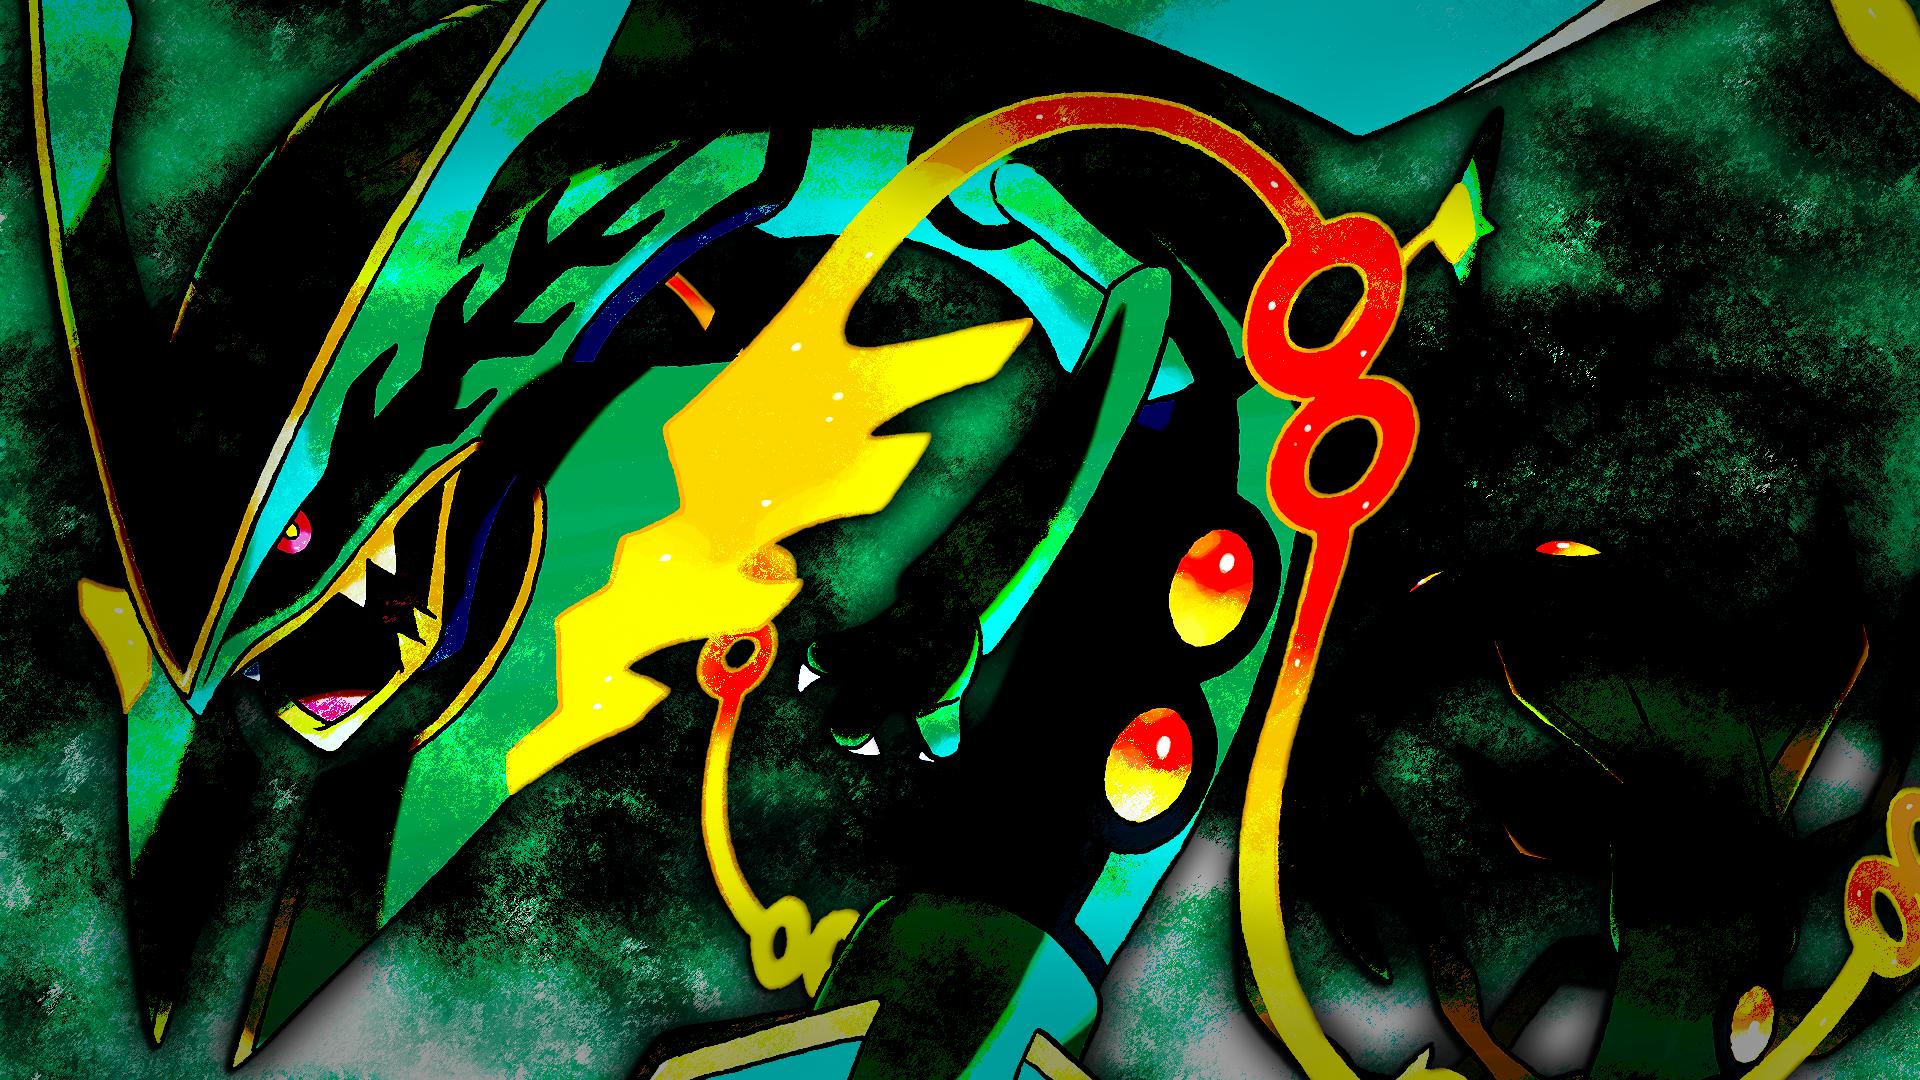 Mega Rayquaza Wallpaper 2 By Glench On DeviantArt